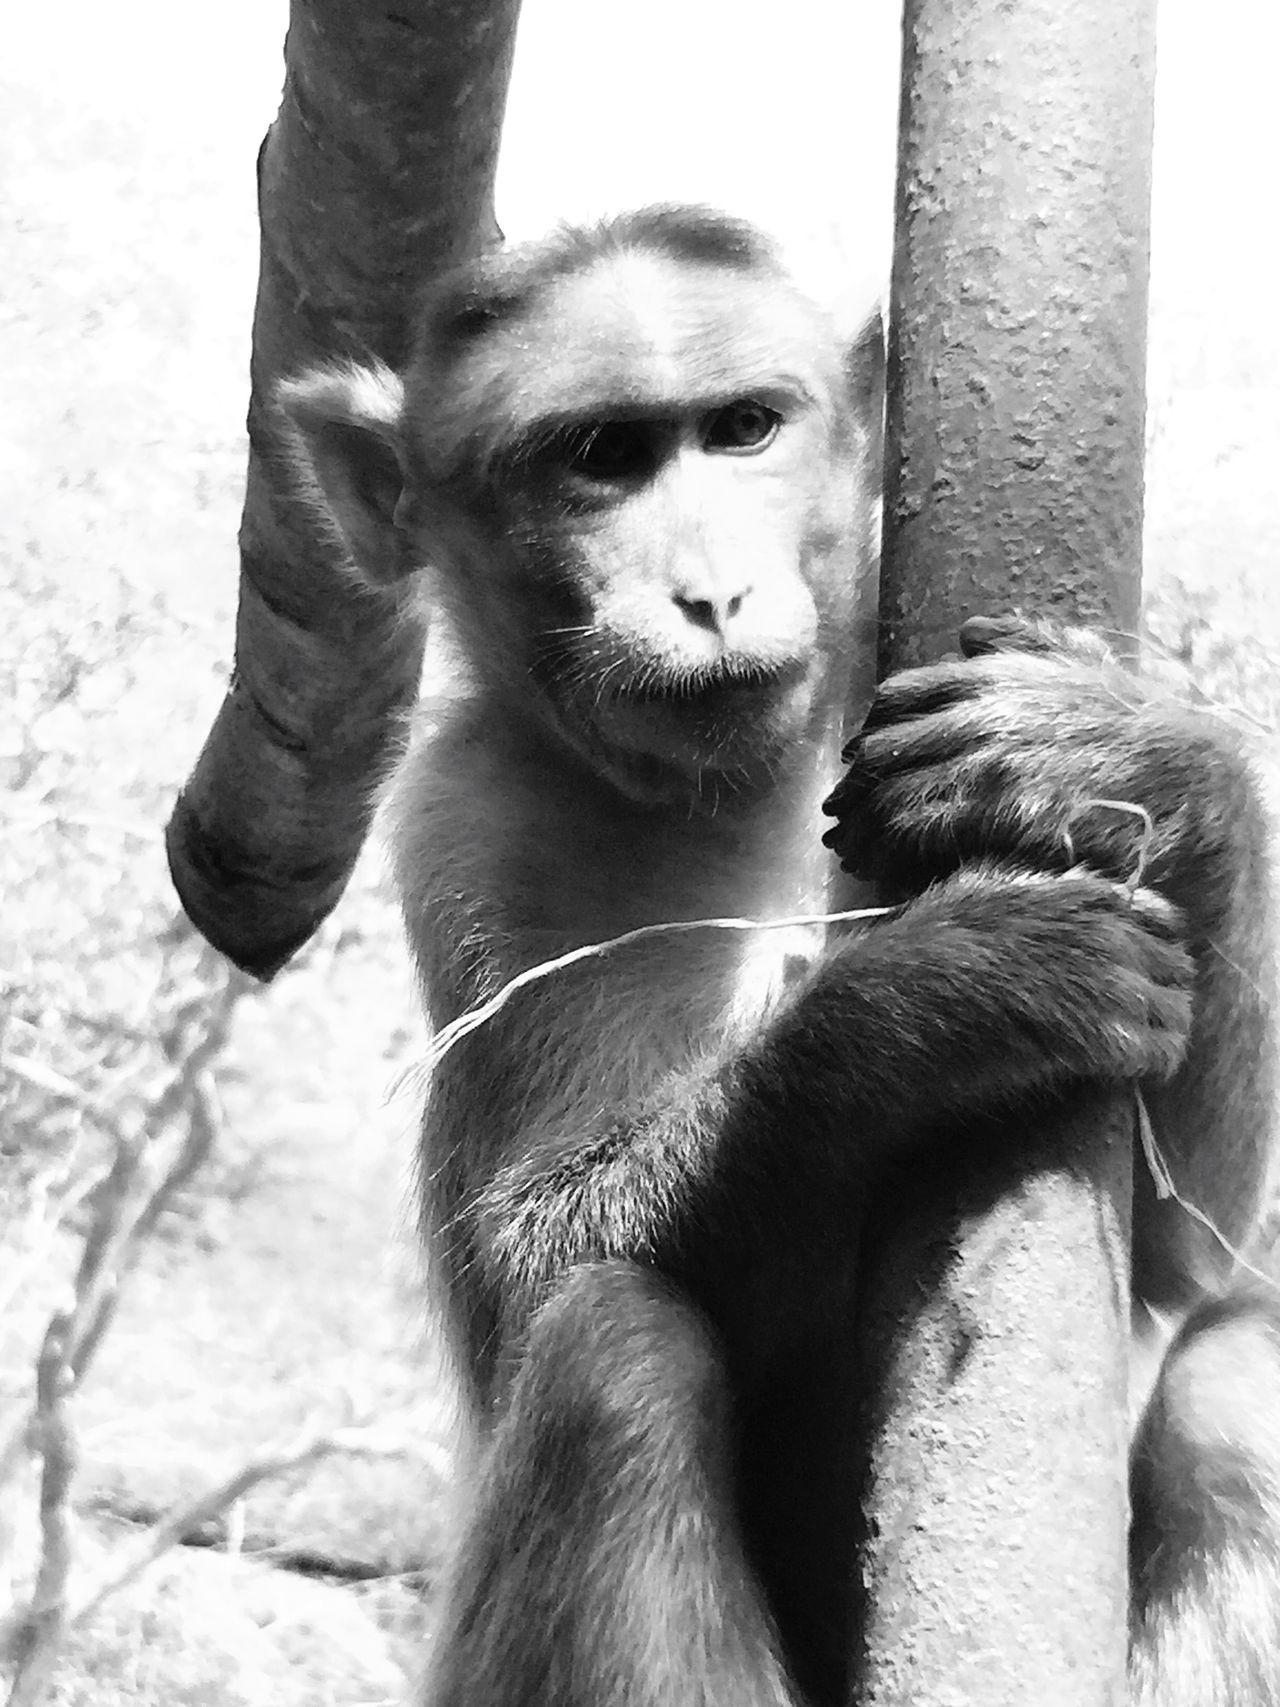 B&W Portrait Monkey Langur India Kanheri Caves Animals IPhoneography